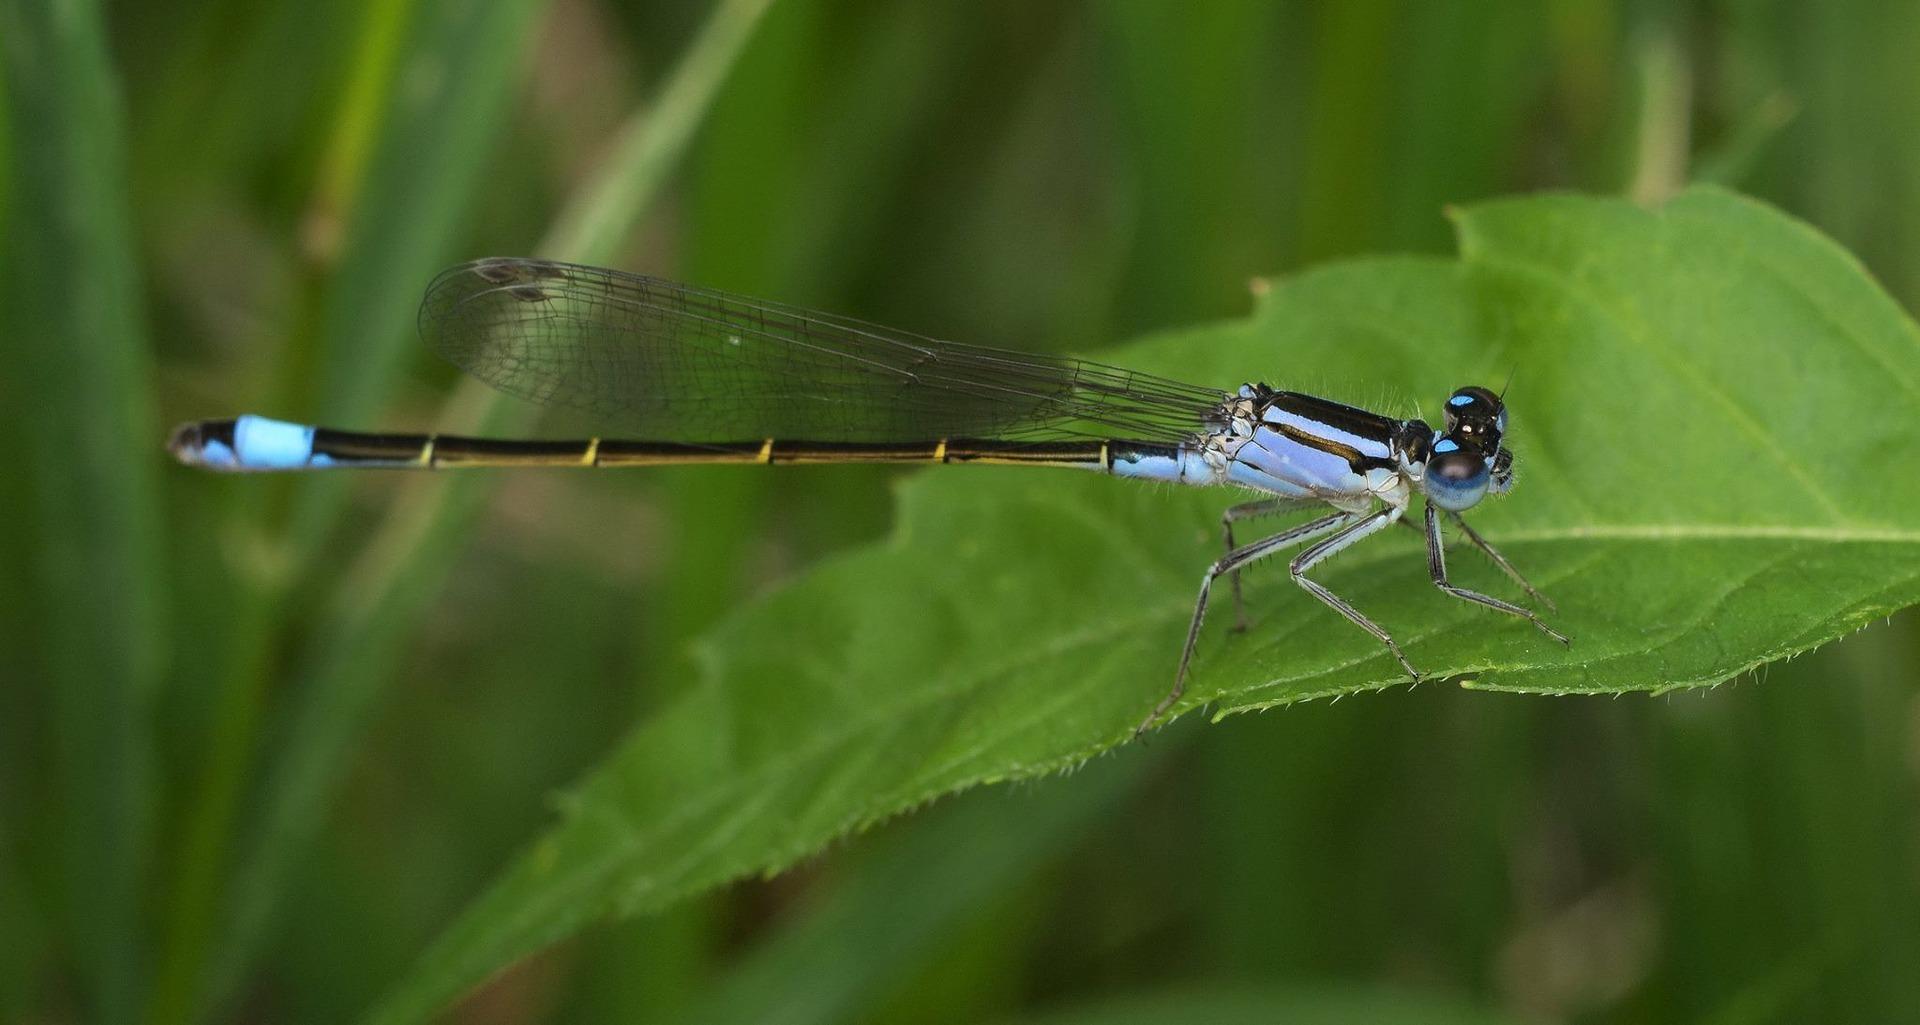 A dragonfly. Credit: XandroGr/pixabay